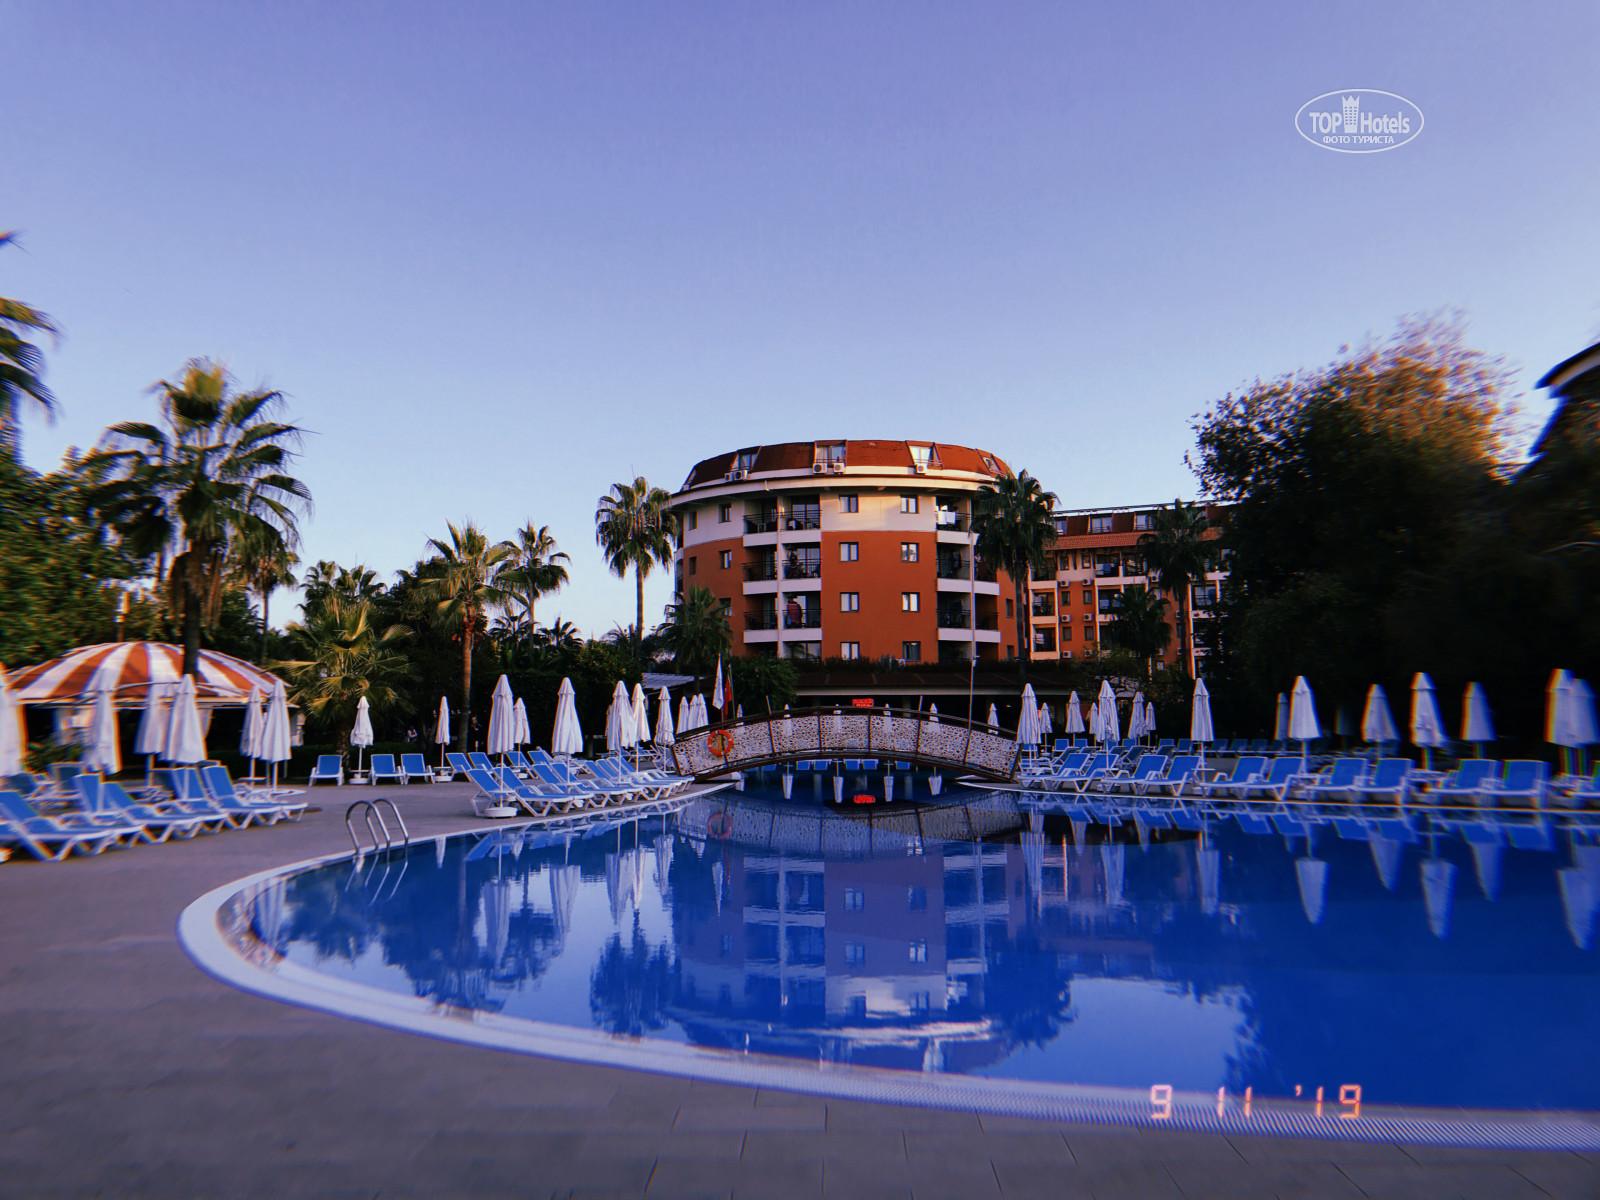 Аланія Palmeras Beach Hotel ціни